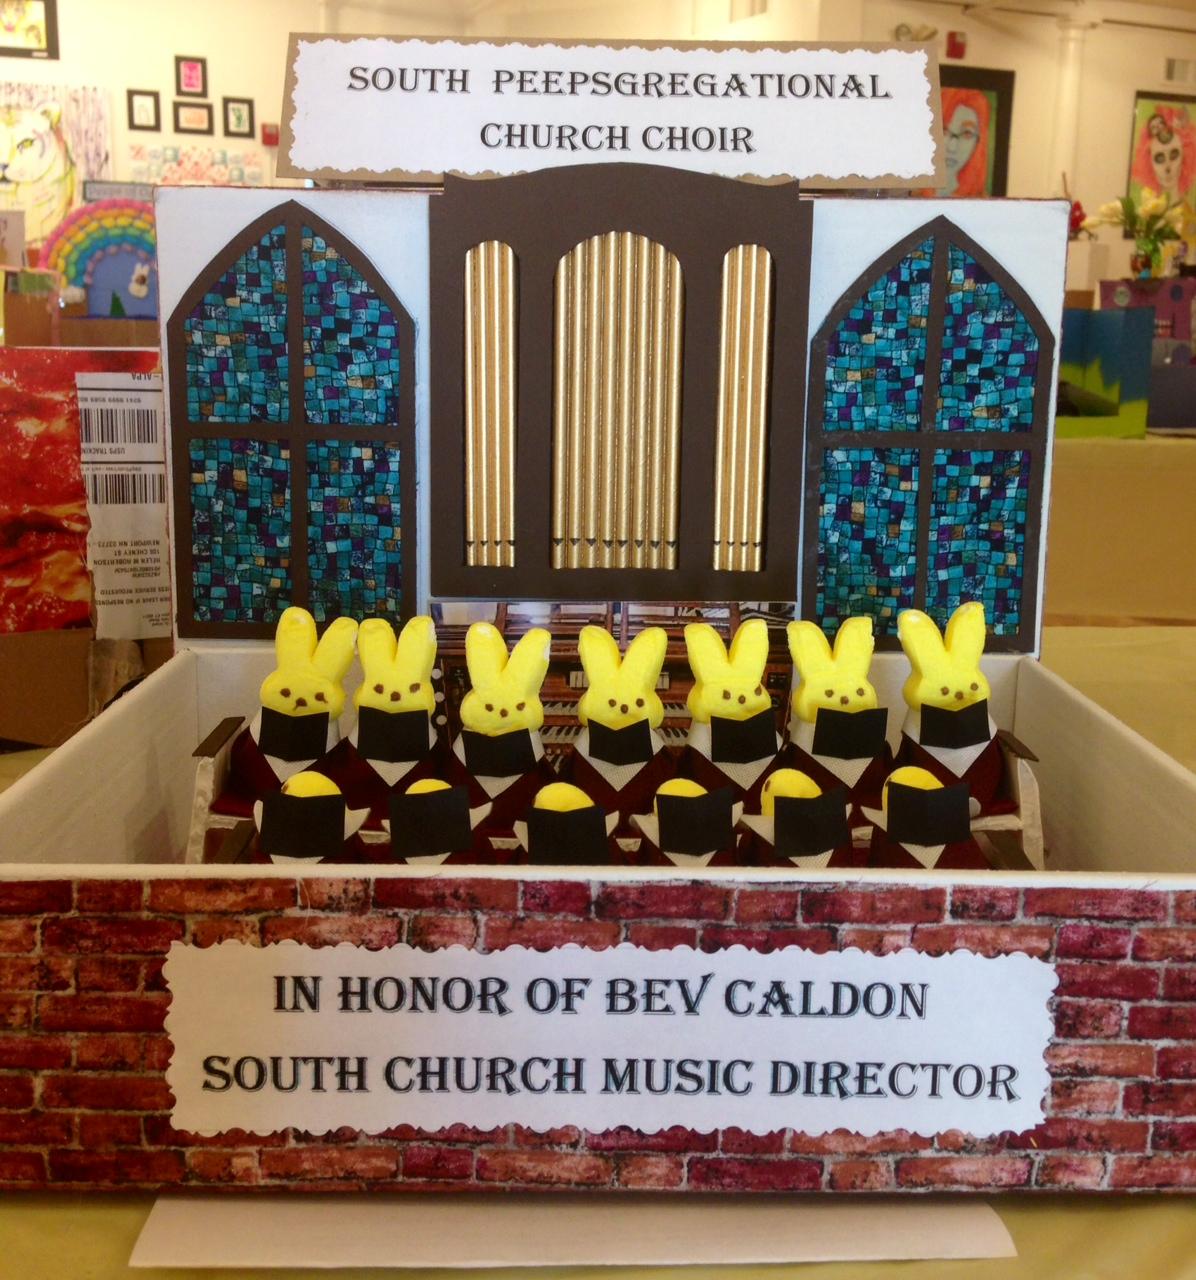 South Peepsregational Church Choir  by Nancy Whynall of Newport, NH